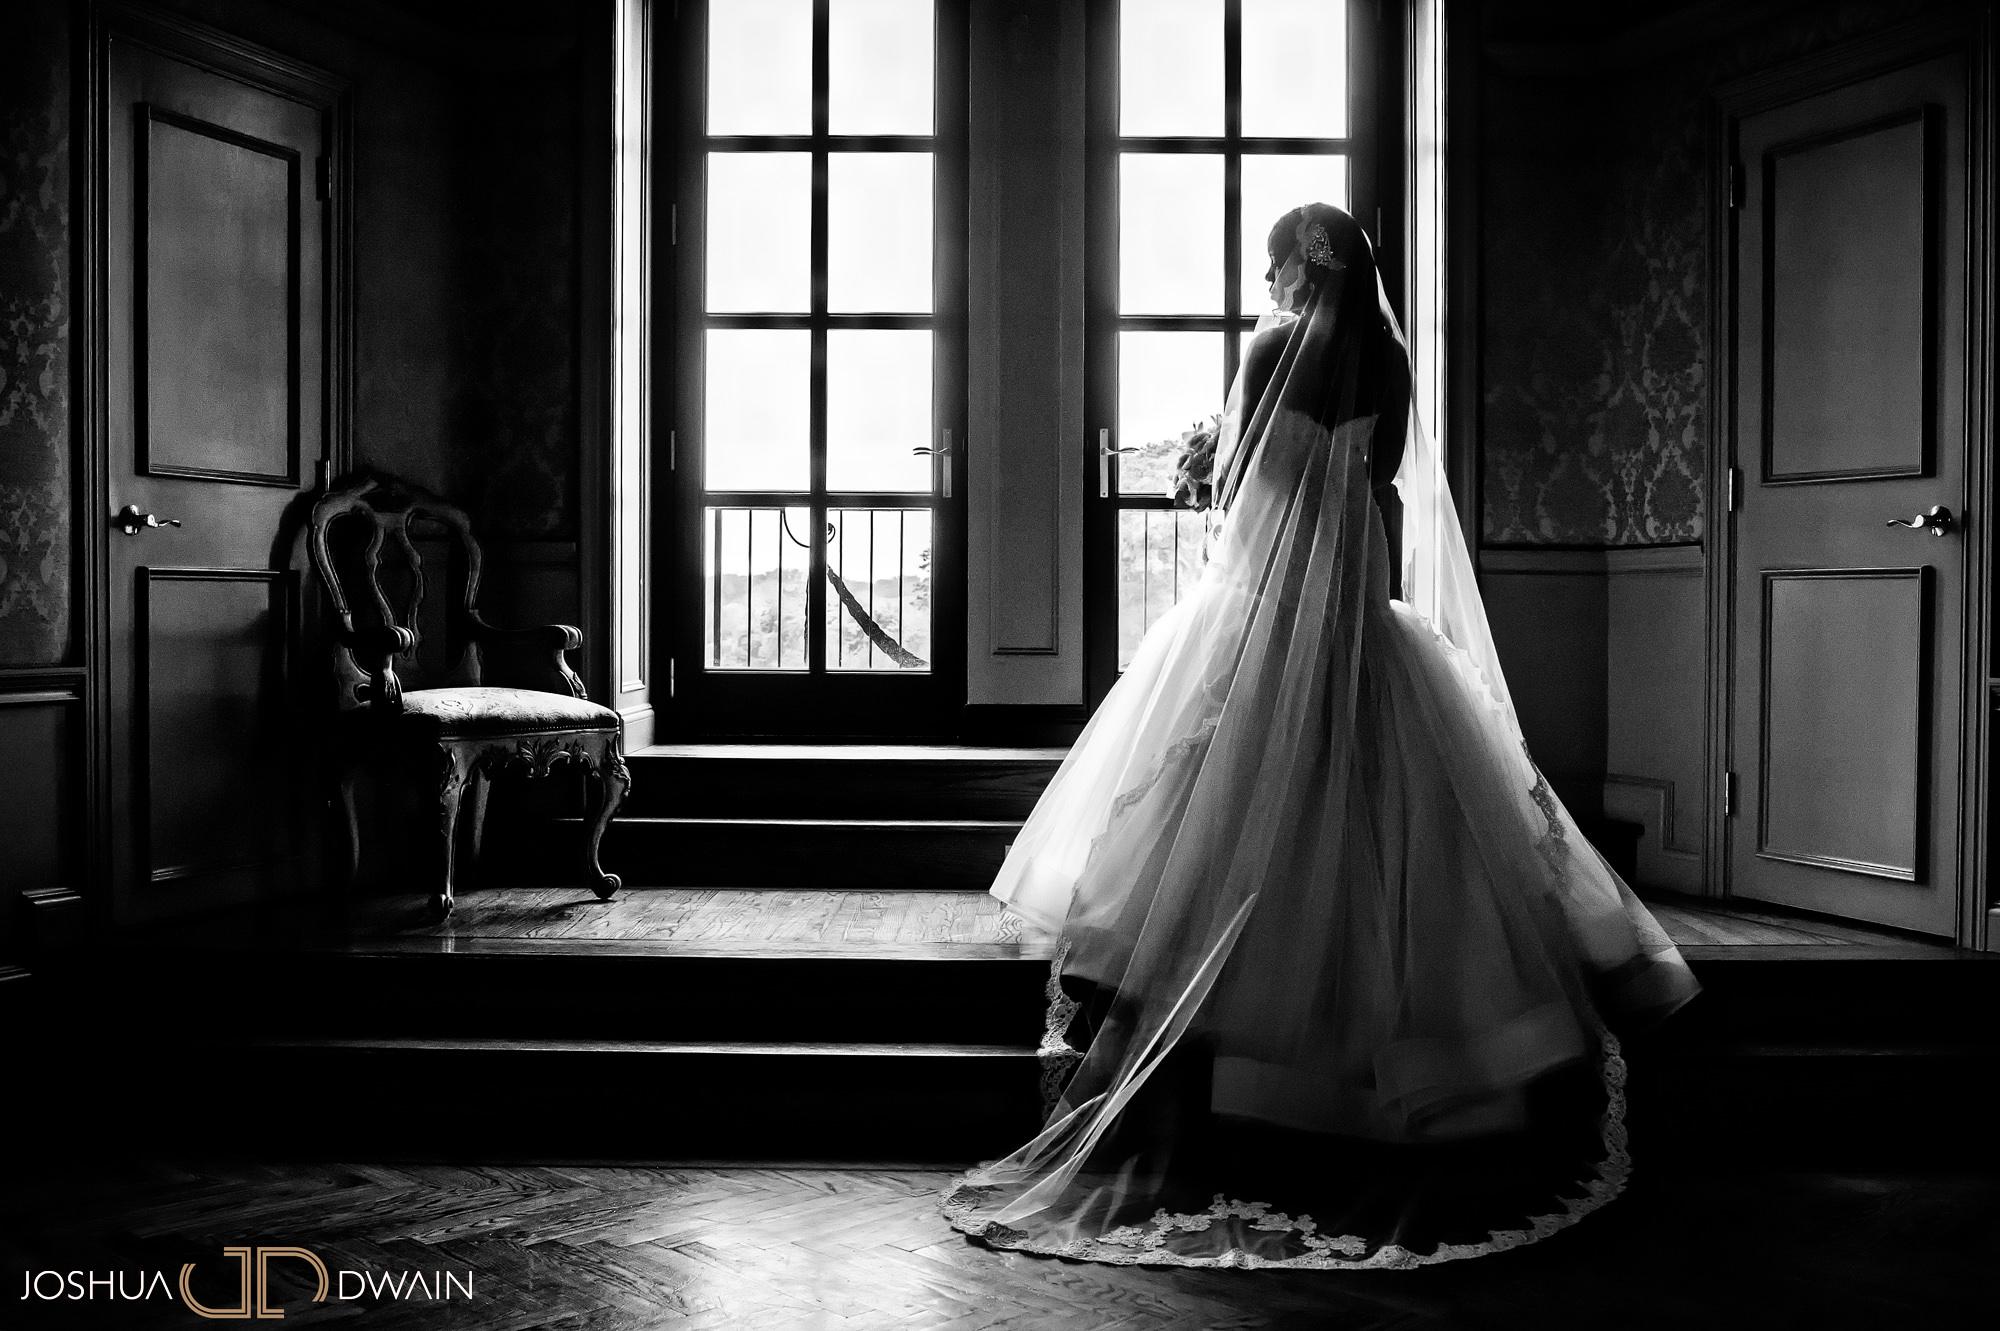 joshua-dwain-weddings-gallery-best-wedding-photographers-us-053